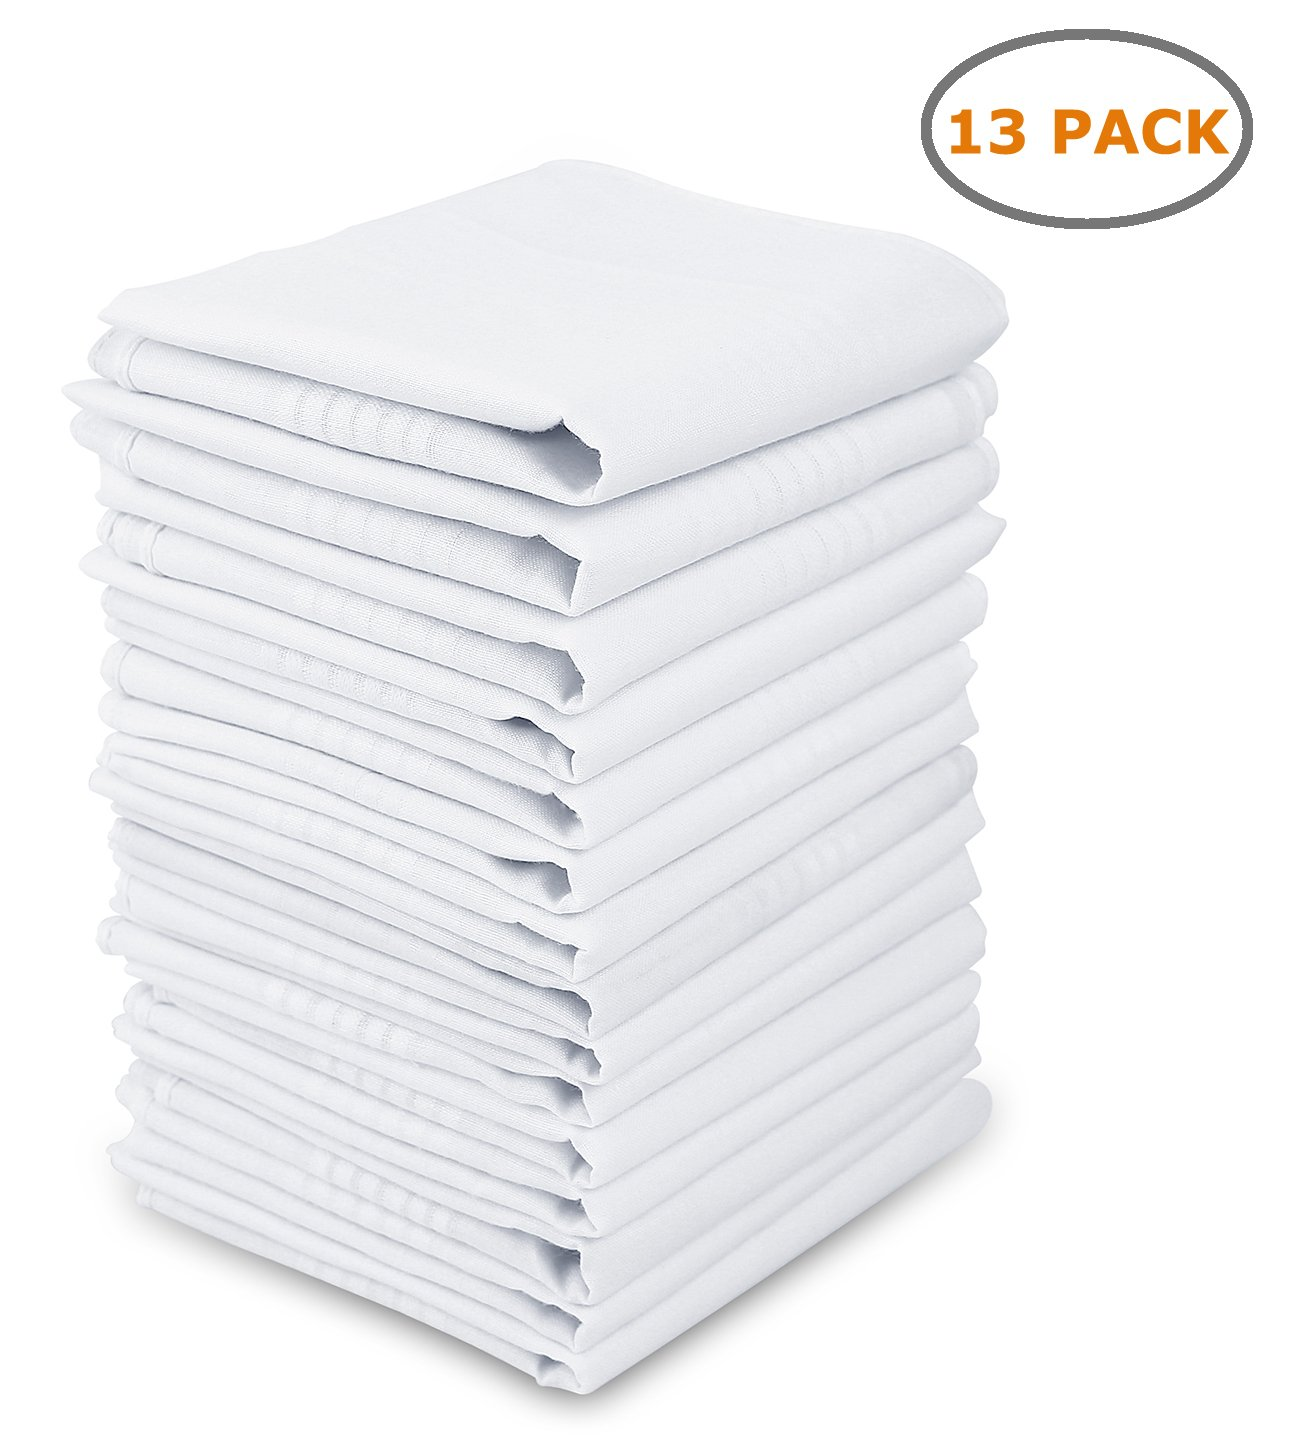 Cotton Handkerchiefs, Ohuhu 13 Pack 100% Pure Cotton White Pocket Square Hankies/Pocket Handkerchief For Men Women